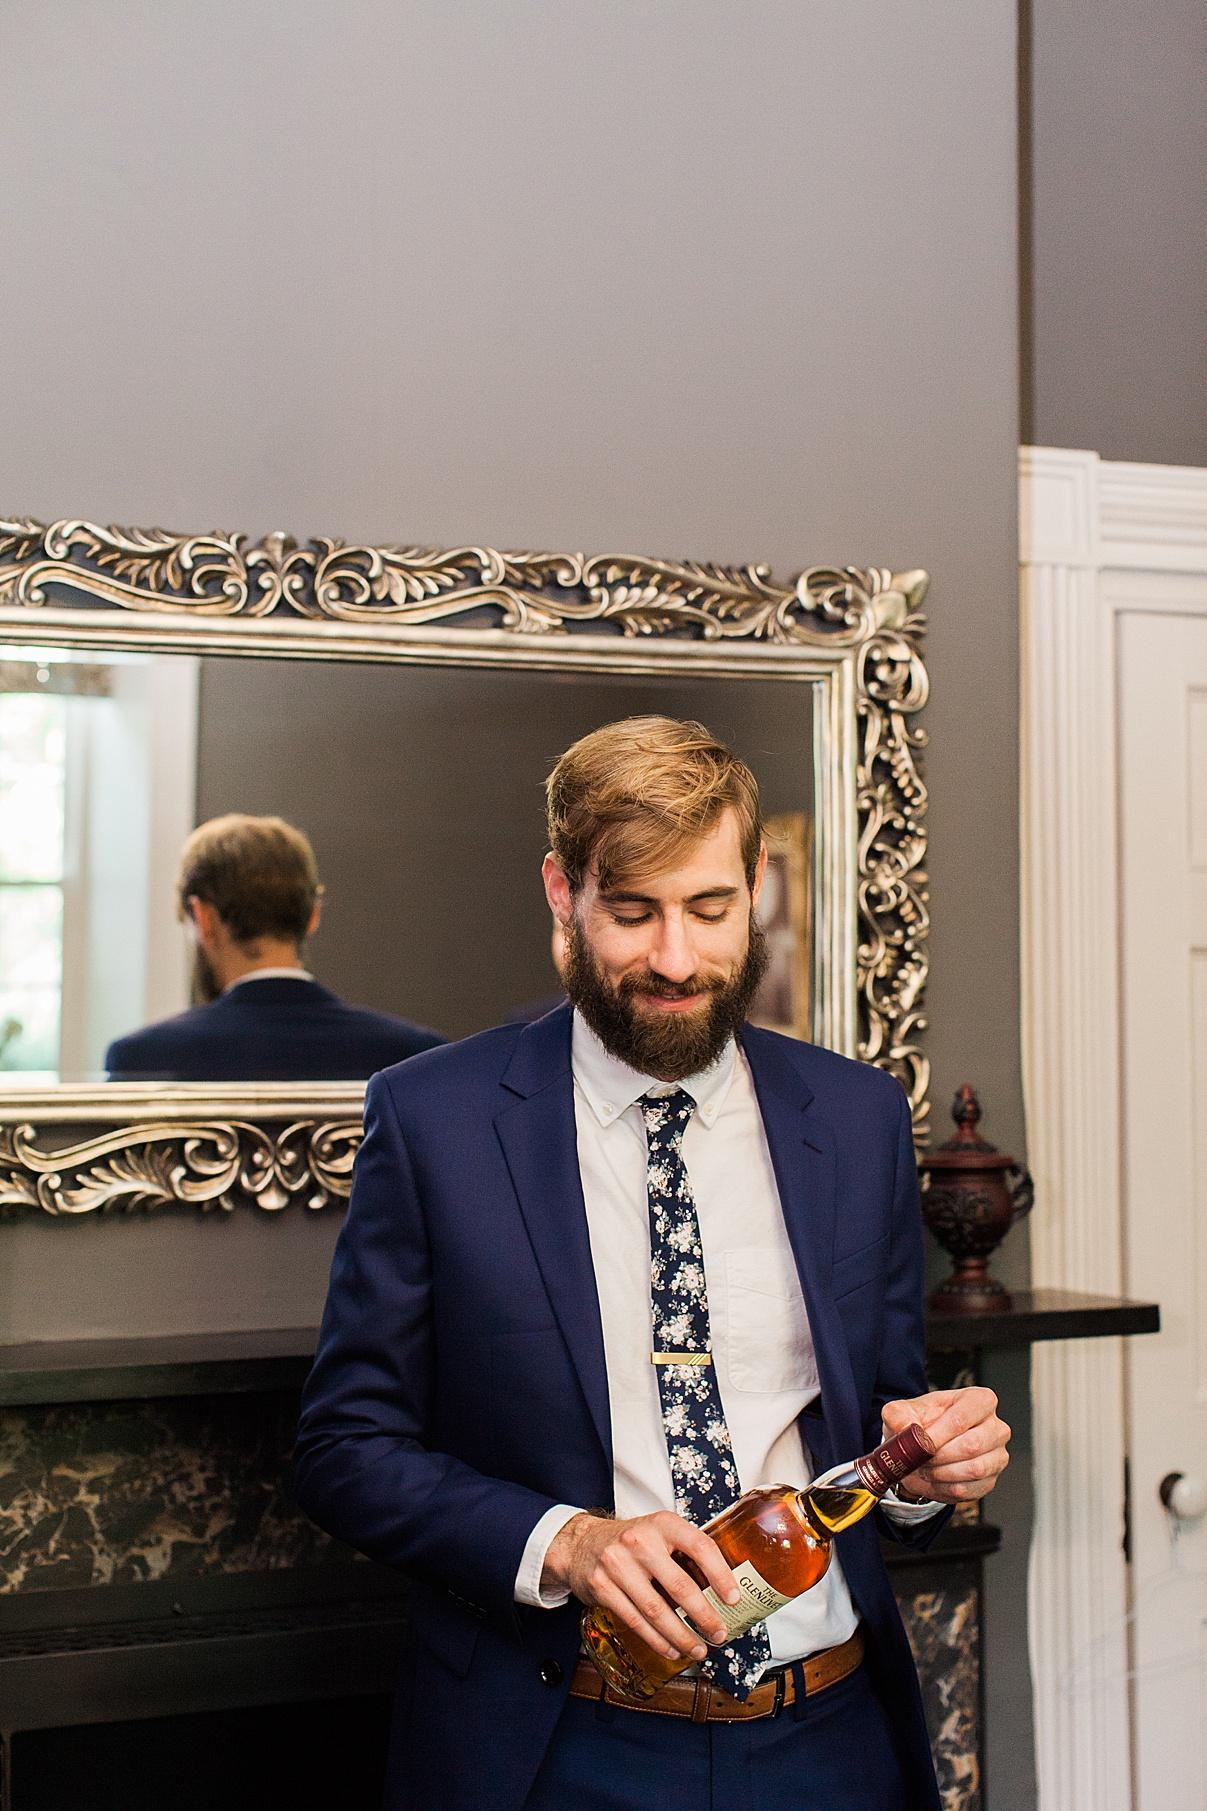 Groom standing in front of mirror opening a bottle of liquor | Balls Falls, Ontario Wedding| Ontario Wedding Photographer| Toronto Wedding Photographer| 3Photography|3photography.ca